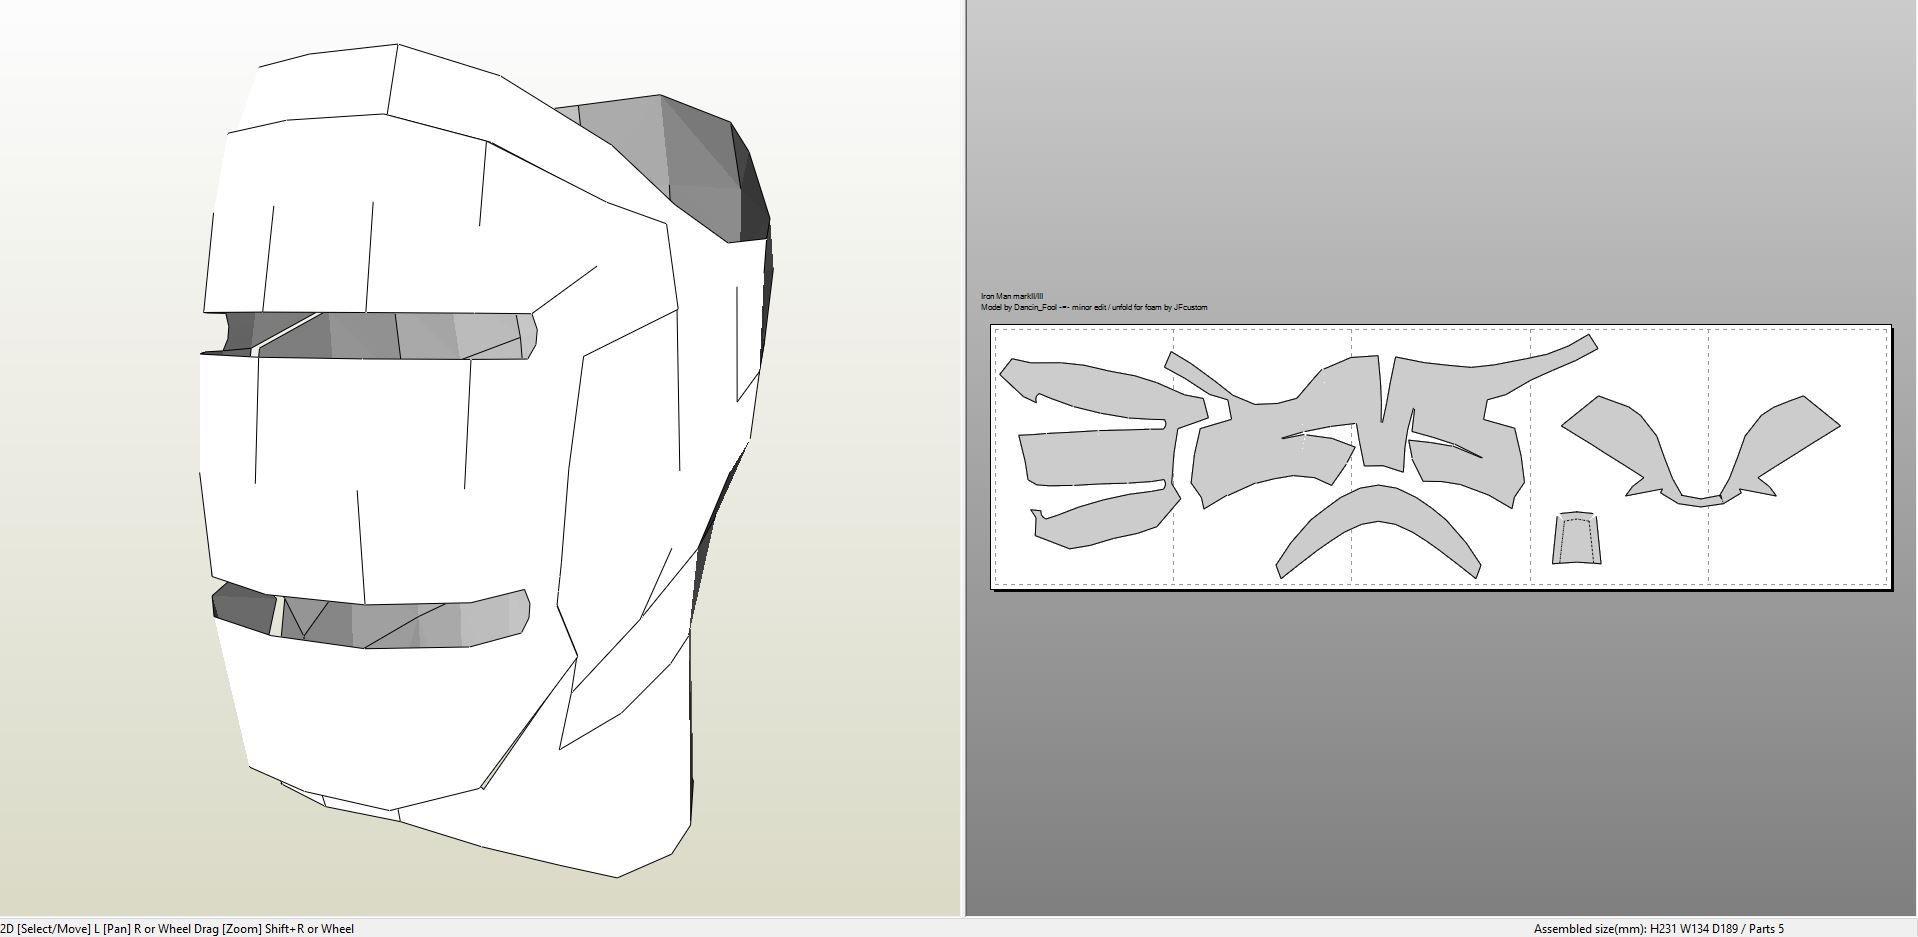 Papercraft Halo Helmet Papercraft Pdo File Template for Iron Man Mark 2 Full Armor Arte